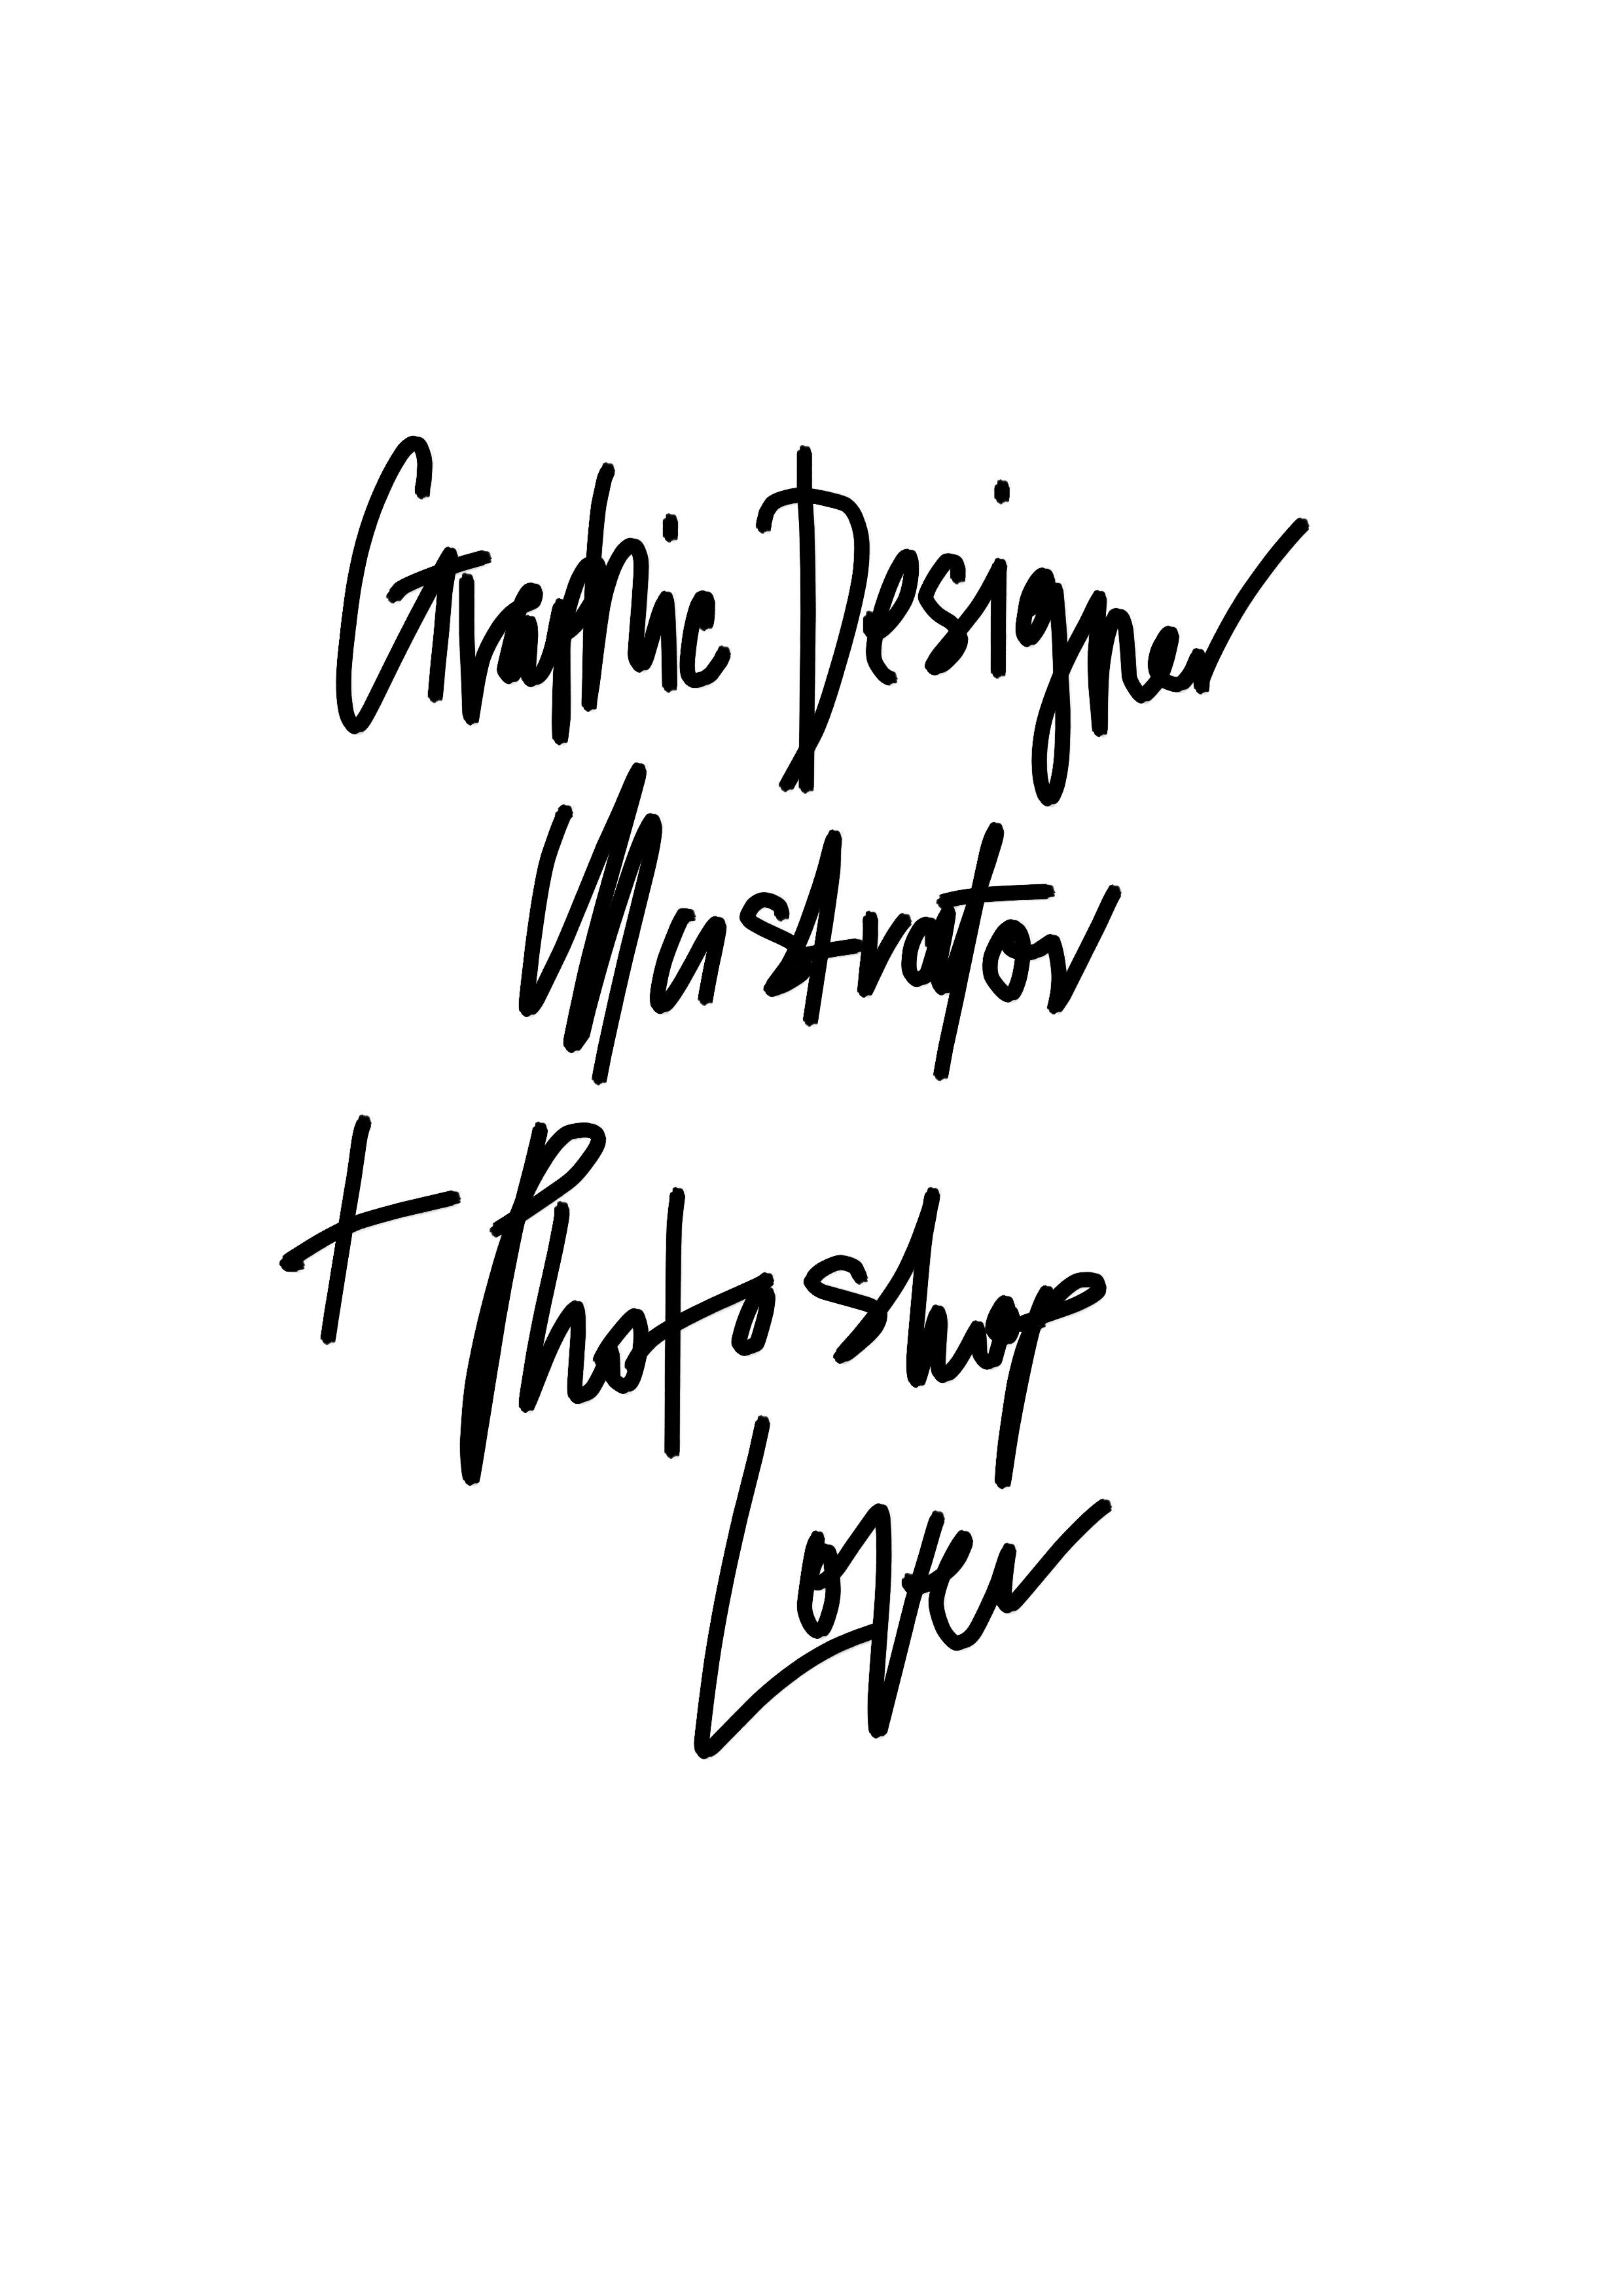 Shyanne Clarke Graphic Design_ Illustrator_ Photoshop Lover_ Digital Collage.jpg